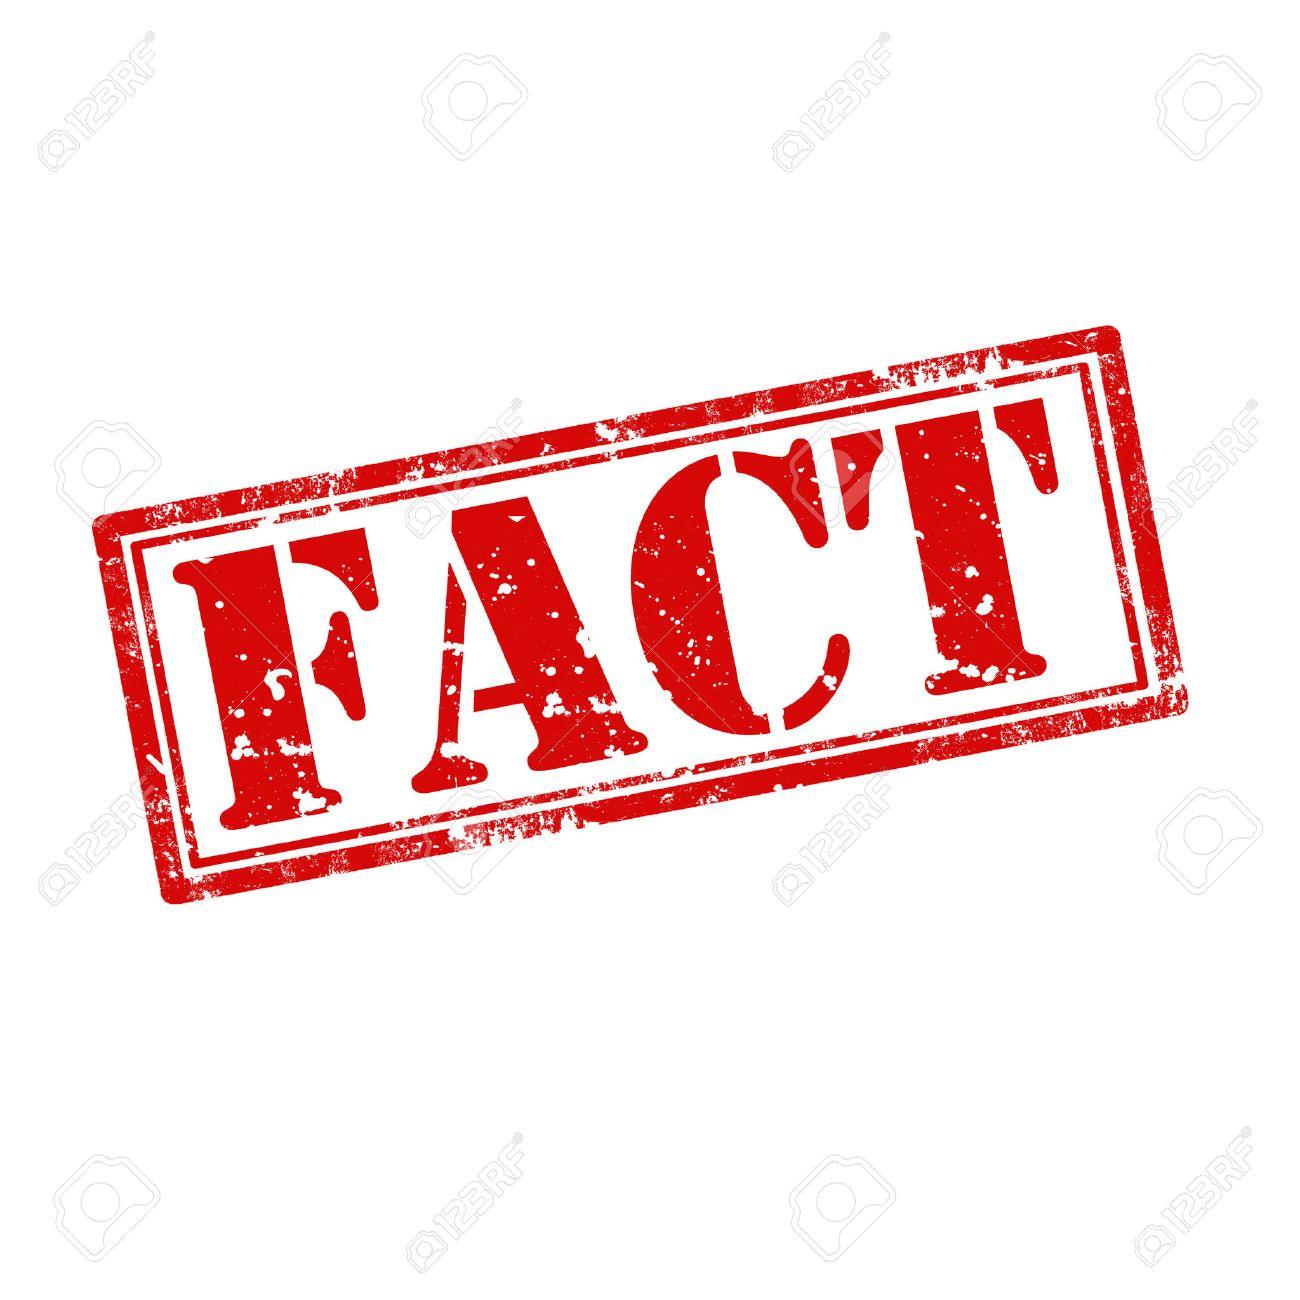 word fact - Ataum berglauf-verband com